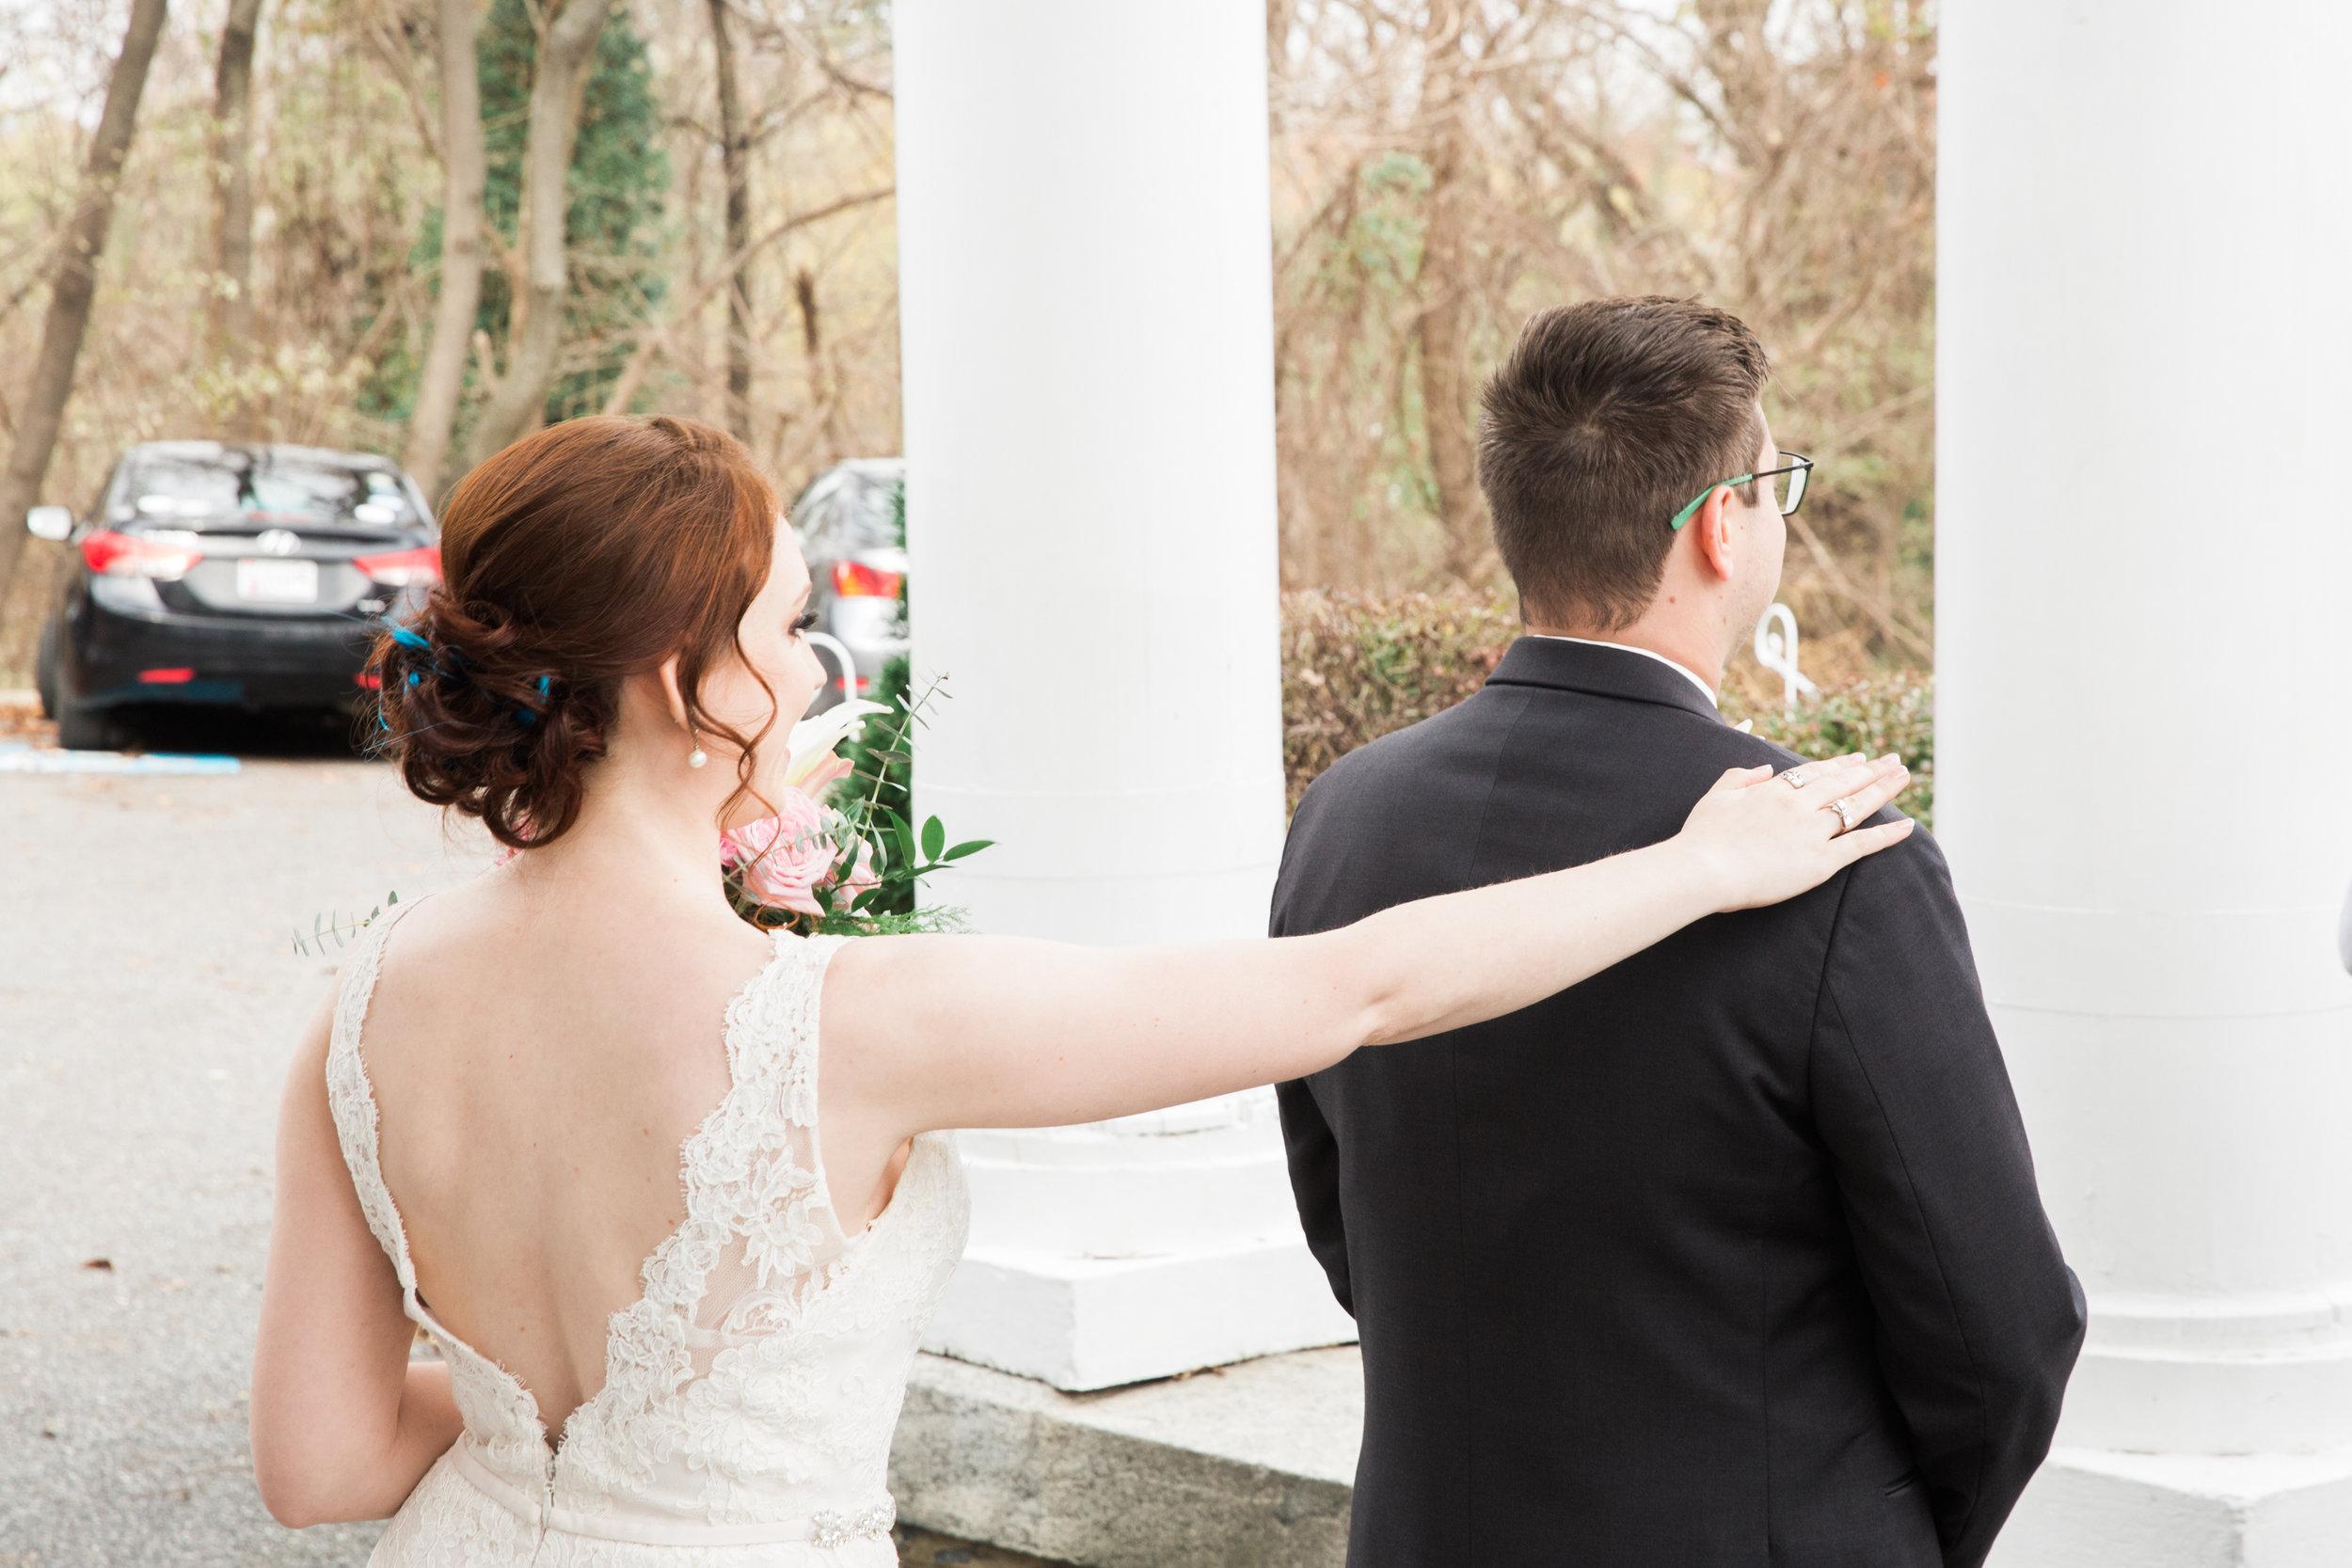 Harry Potter Wedding at Overhills Mansion Catonville Maryland Wedding Photographers Megapixels Media (34 of 134).jpg